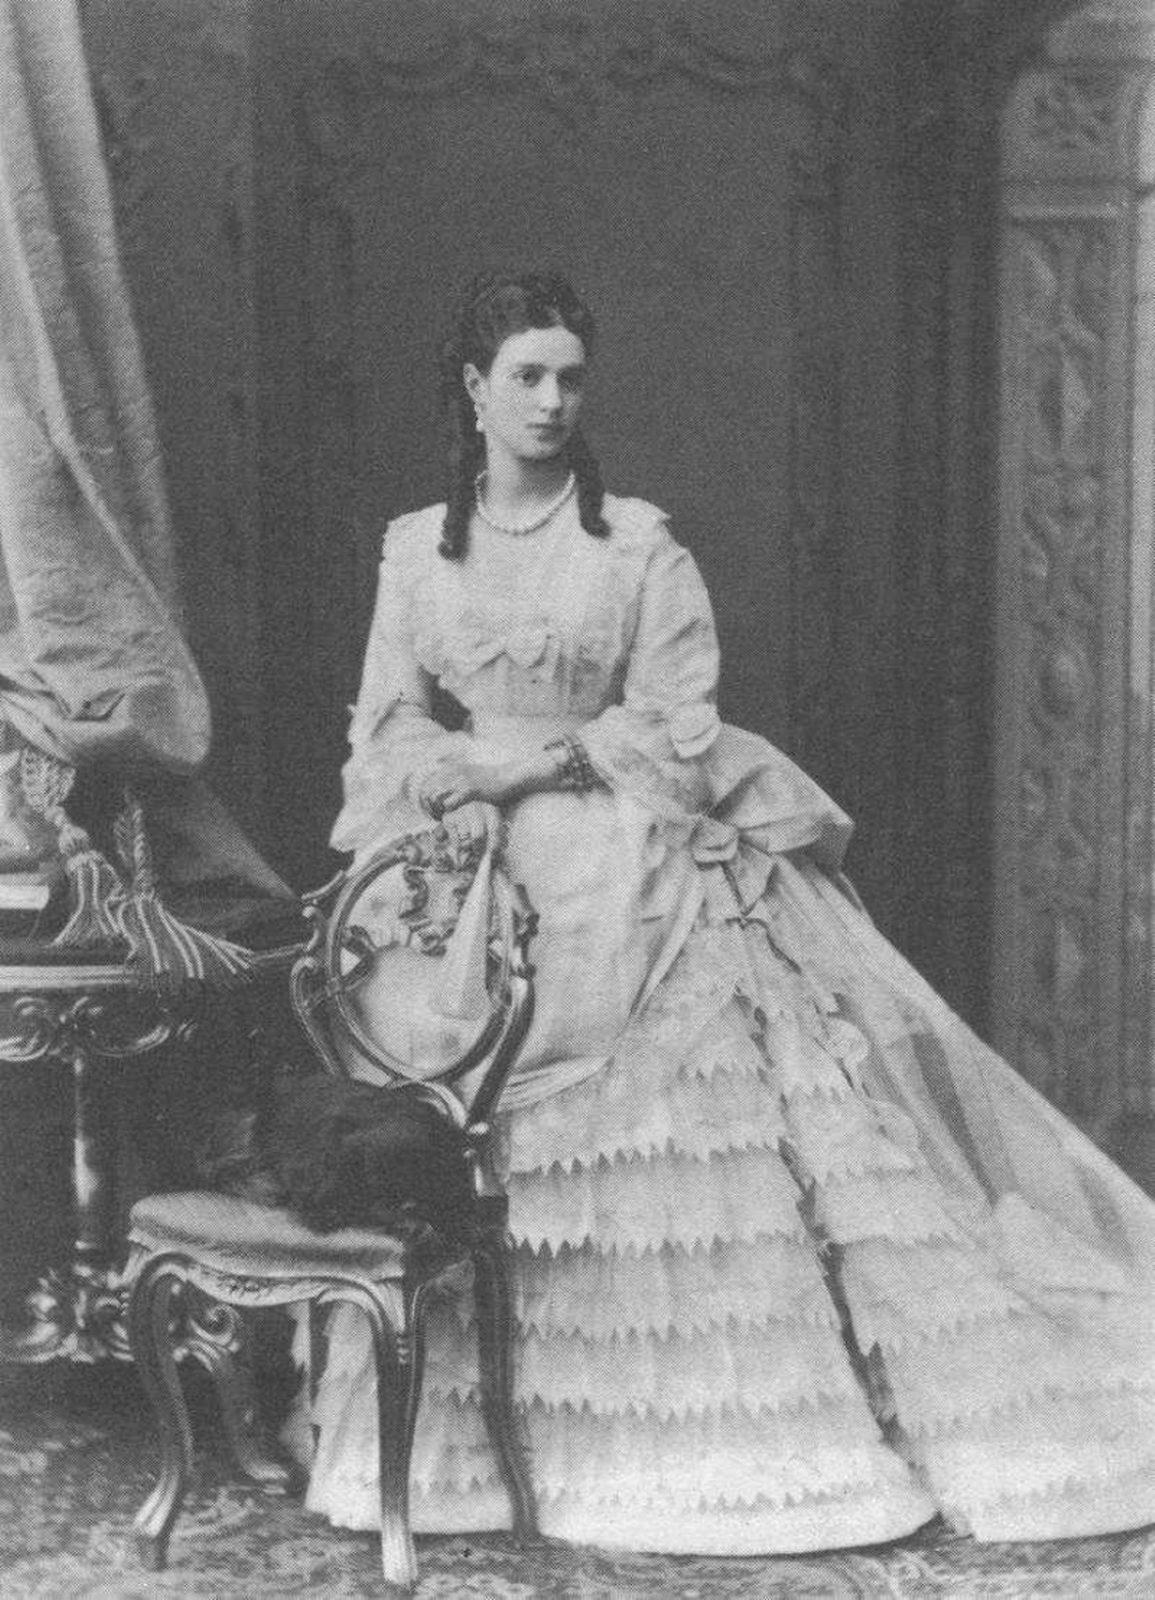 Tsesarevna Maria Feodorovna (Danish princess Maria Dagmar) the wife of the Tsarevich Alexander Alexandrovich (Alexander III). Around 1868.